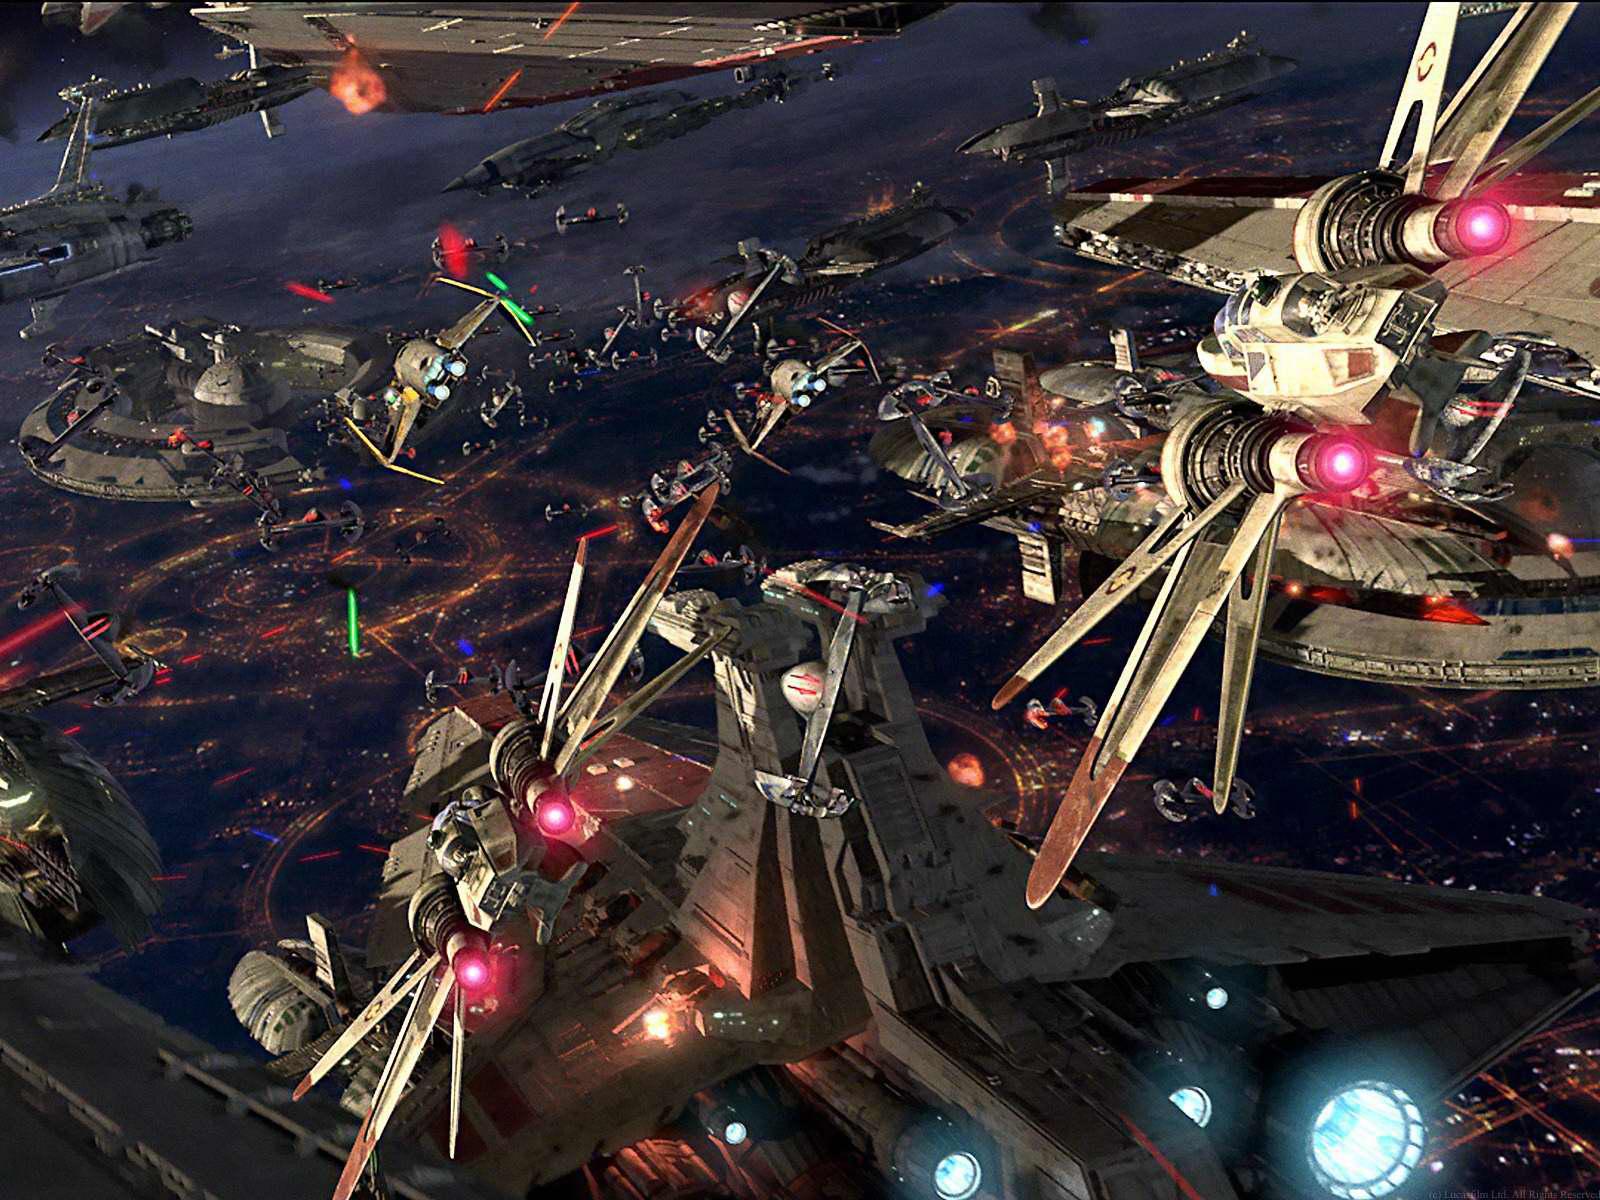 Star Wars Space Battle Wallpaper Battle Of Coruscant Wallpaper Hd 1600x1200 Wallpaper Teahub Io